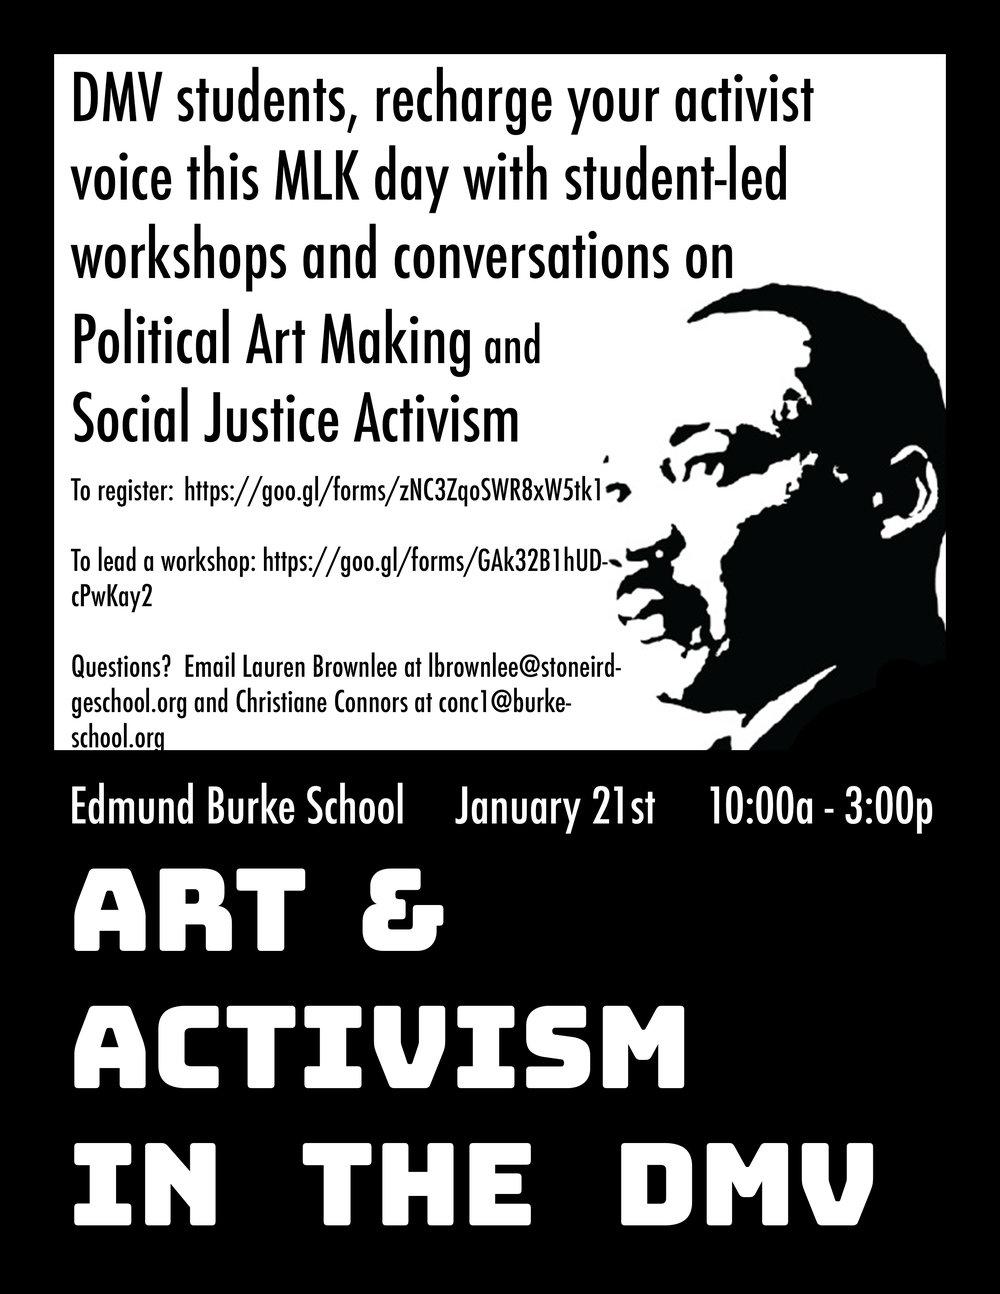 Art&ActivismInTheDMVFlyer.jpg